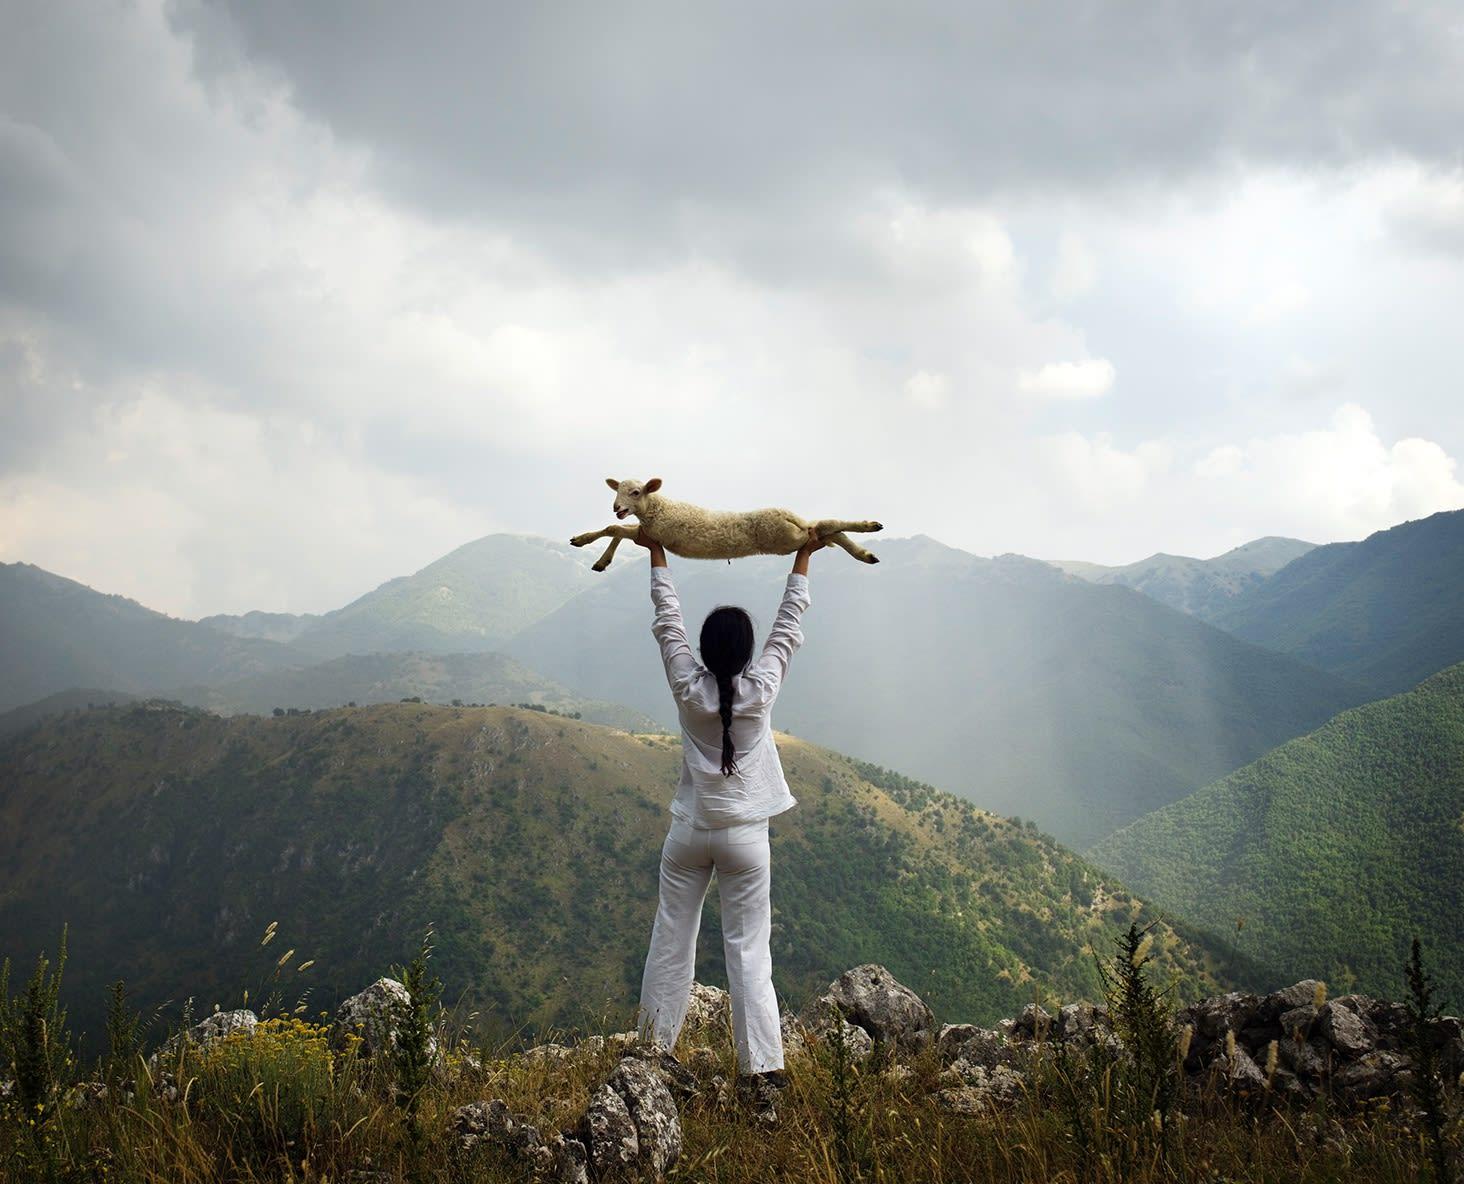 marina abramovic, holding the lamb, performance, photography, frieze